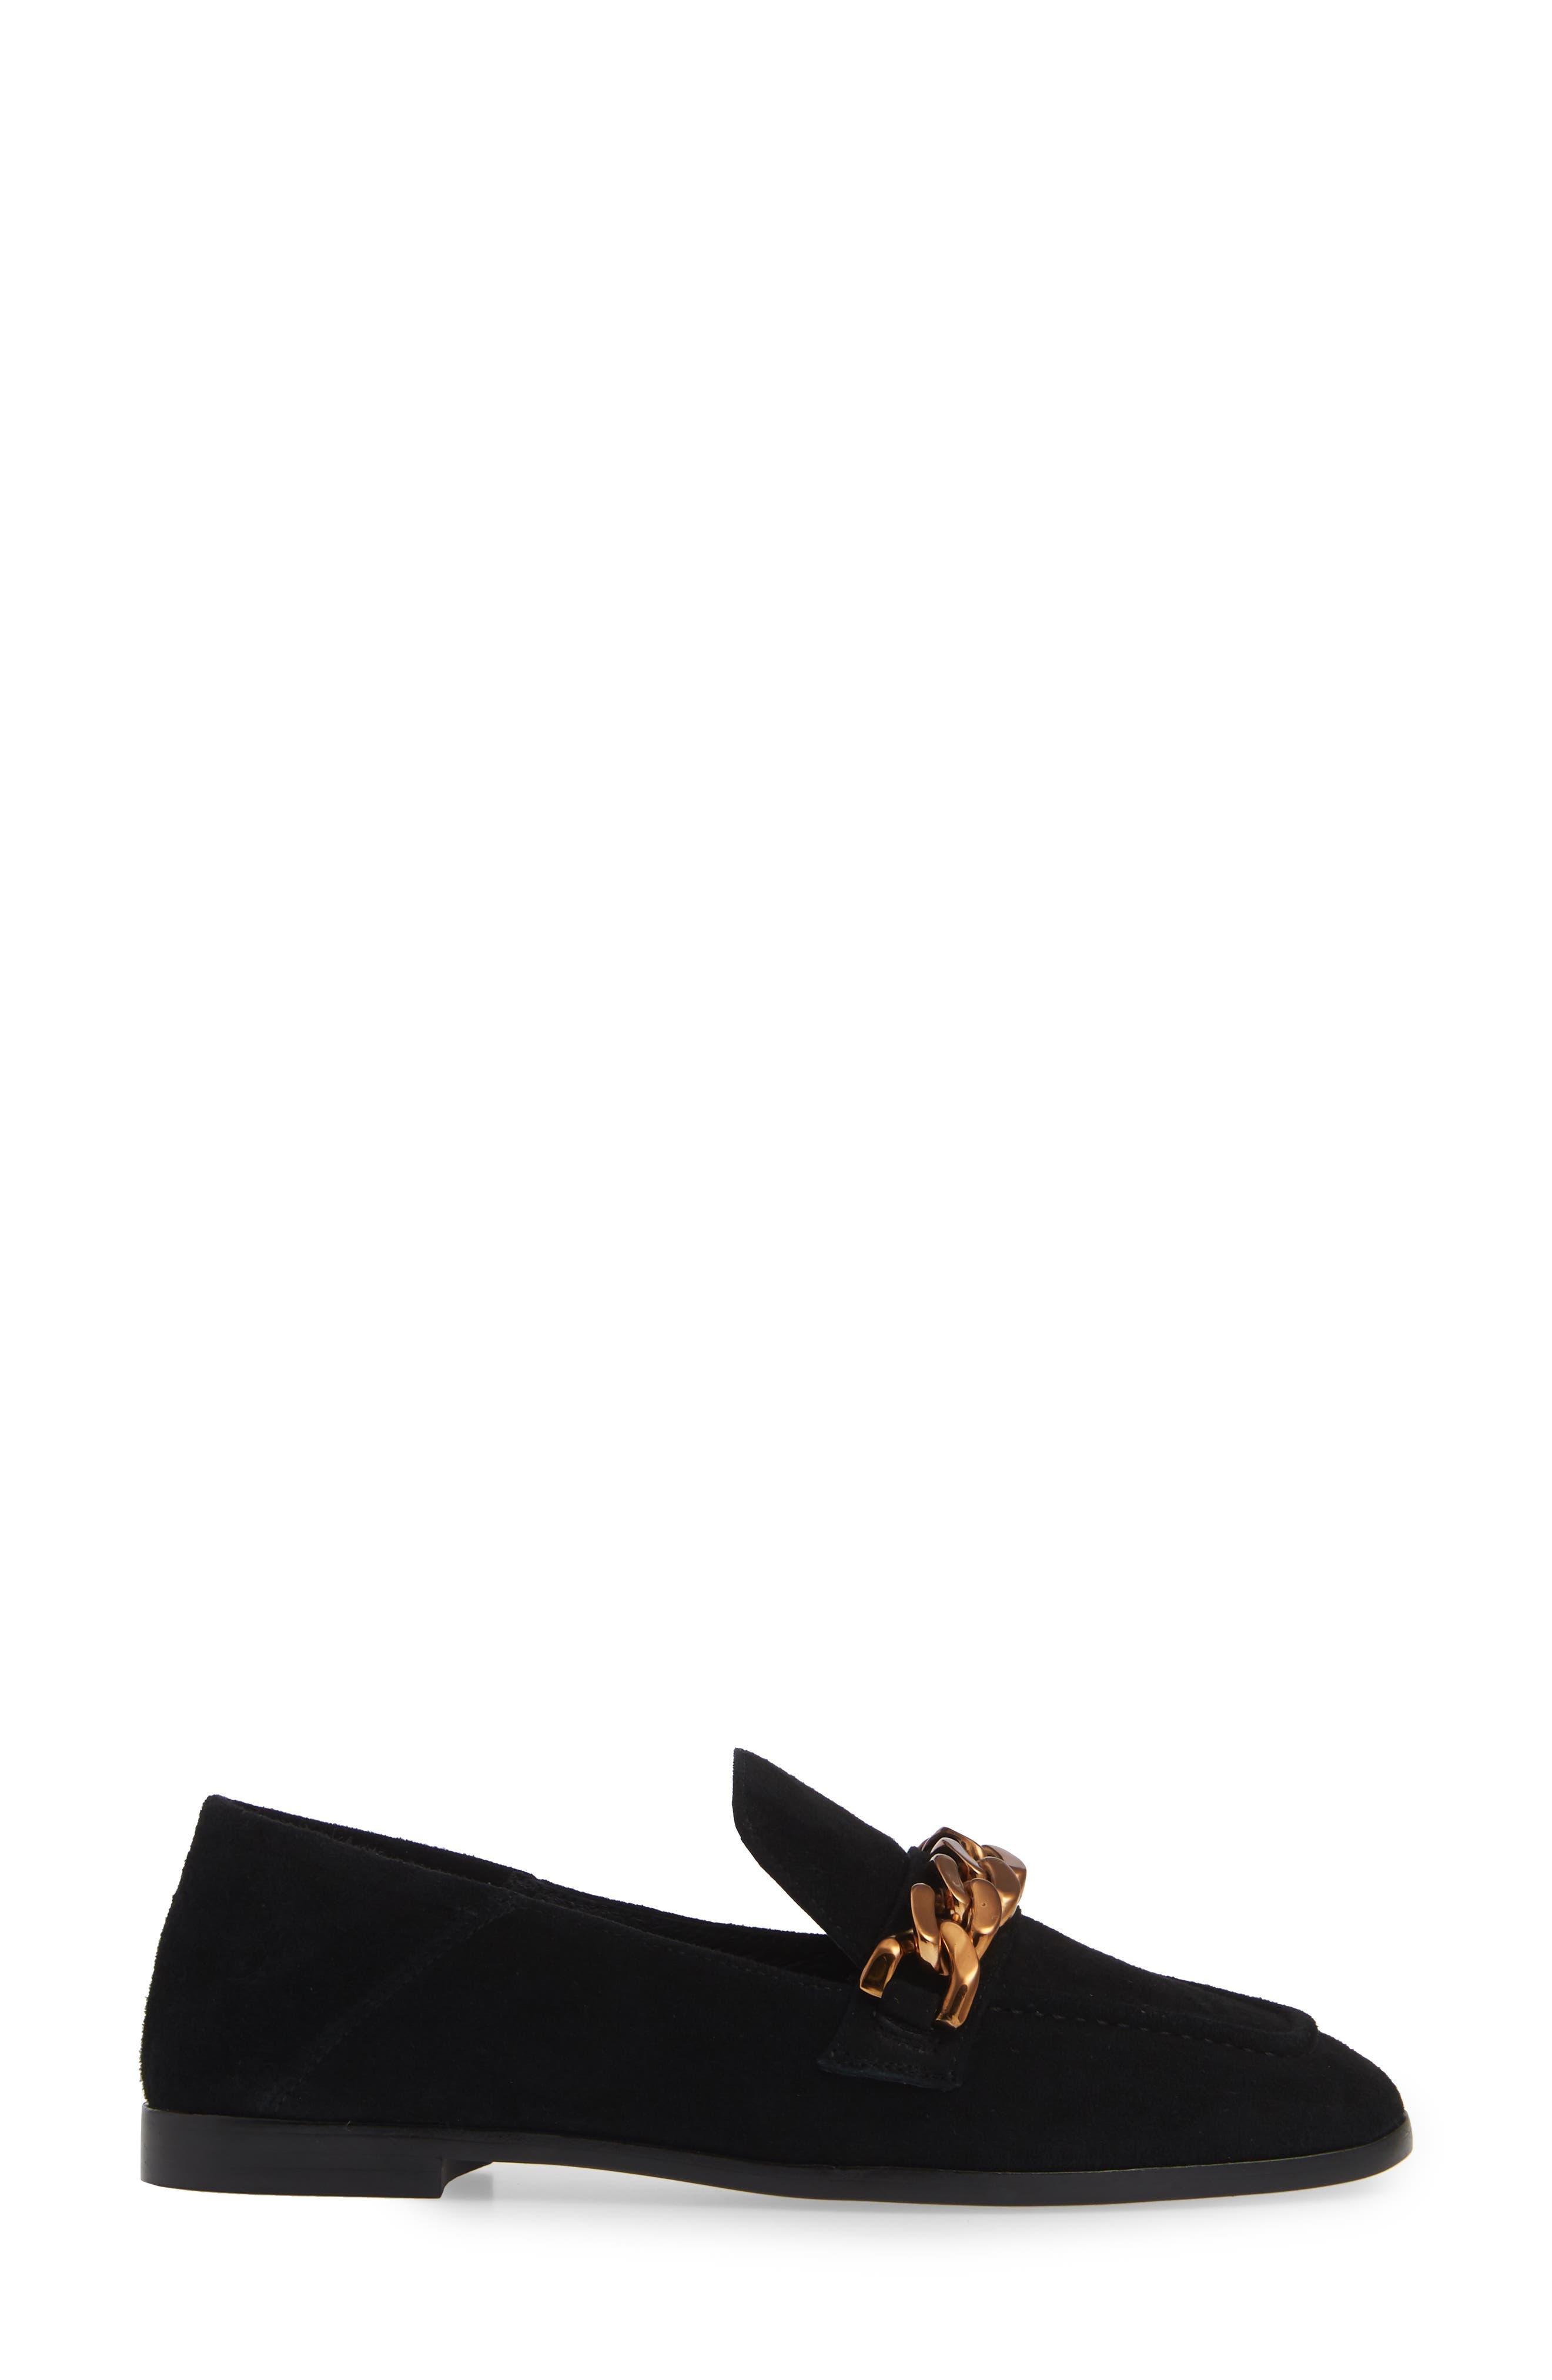 Jesse Convertible Heel Loafer,                             Alternate thumbnail 2, color,                             BLACK SUEDE BRONZE